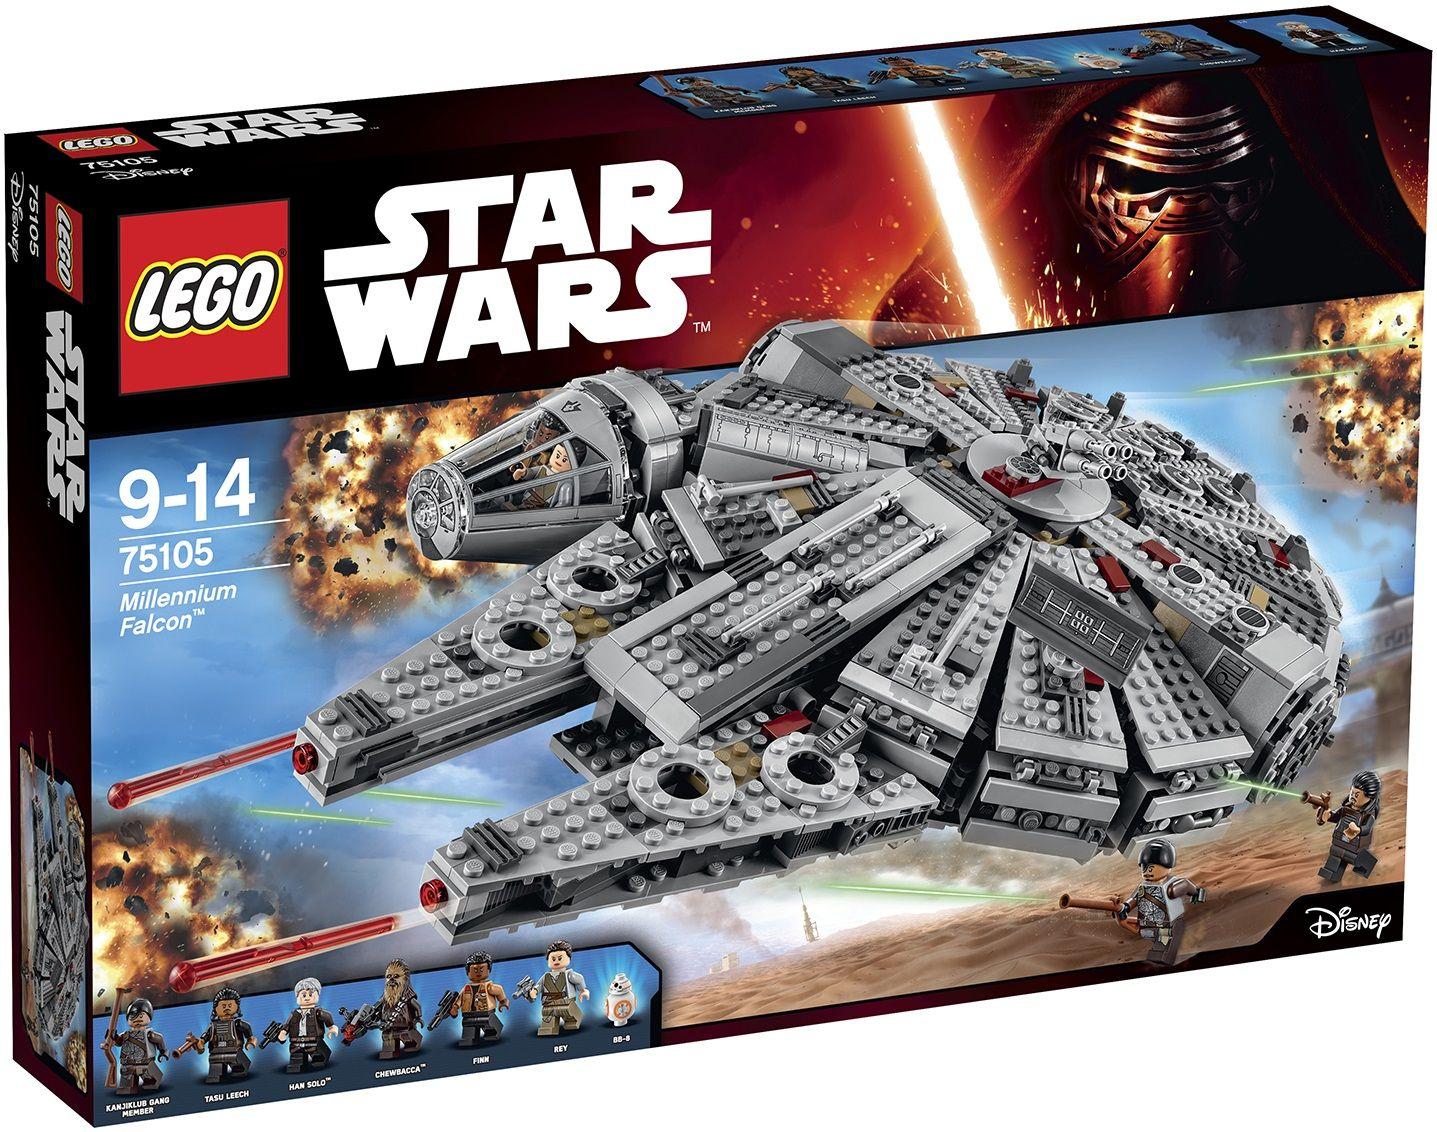 I nuovi set Lego di Star Wars: The Force Awakens